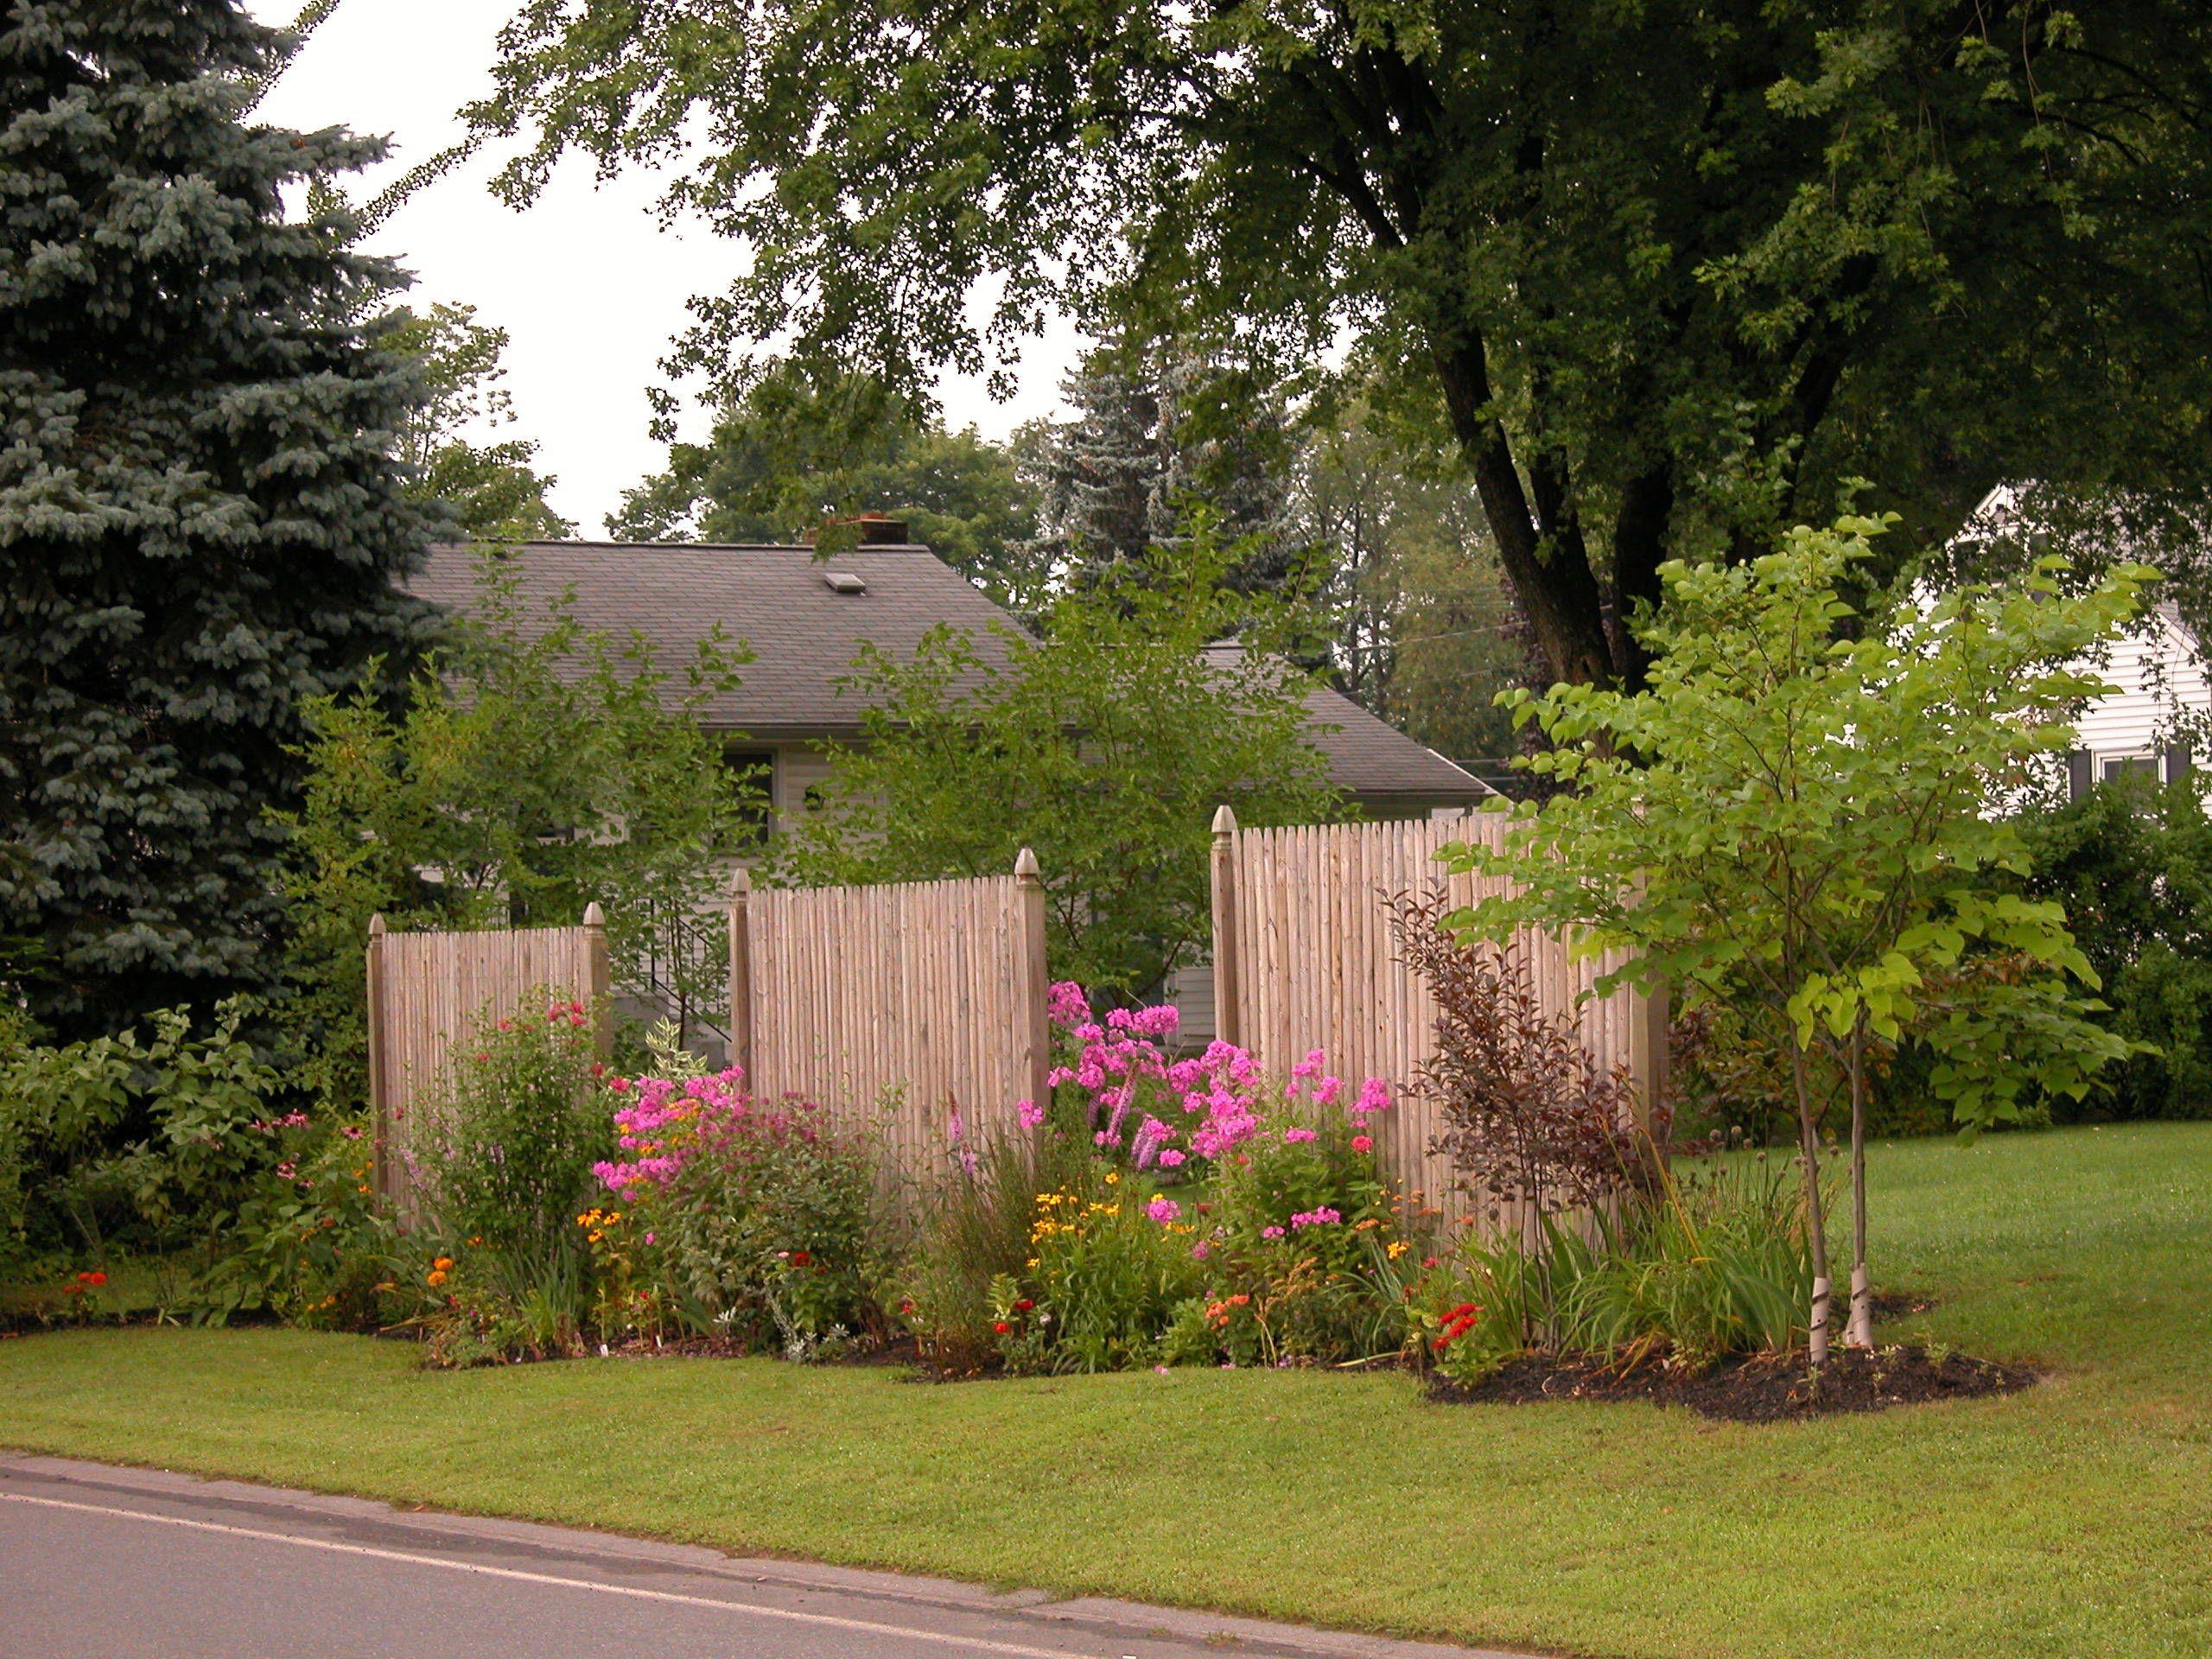 designing a small garden | pinterest | backyard privacy, small